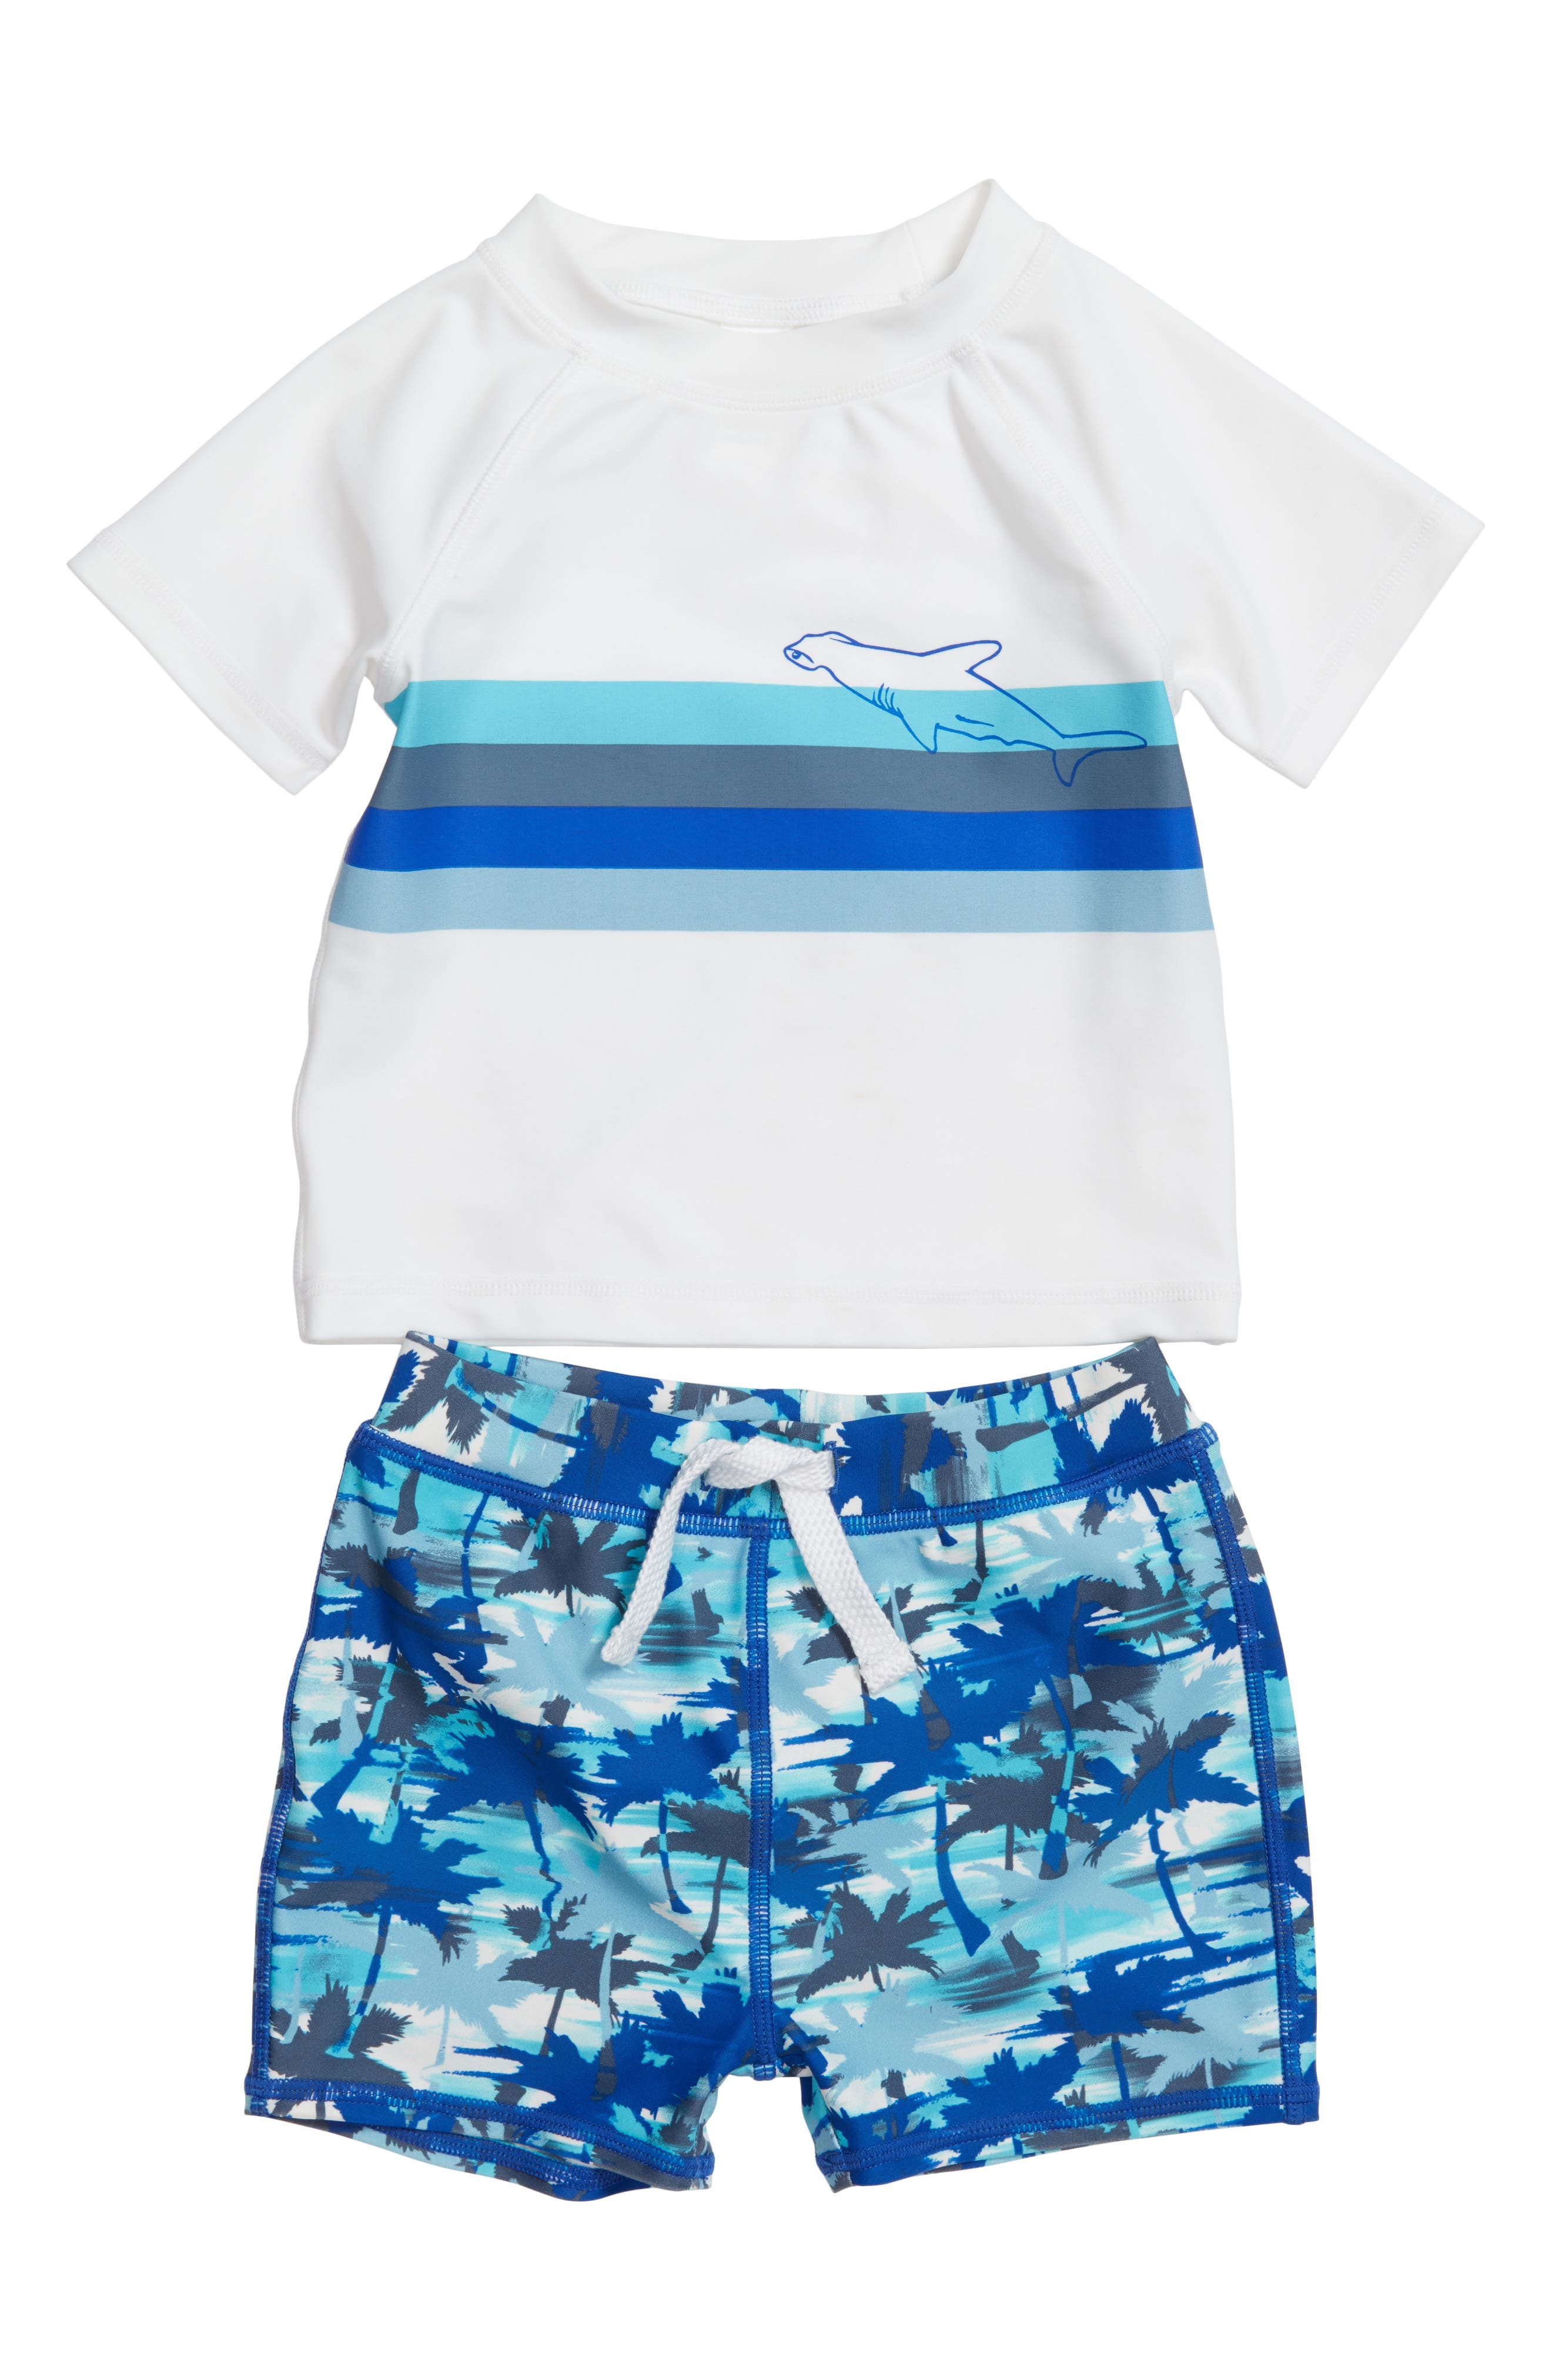 Two-Piece Rashguard Swimsuit,                             Main thumbnail 1, color,                             101